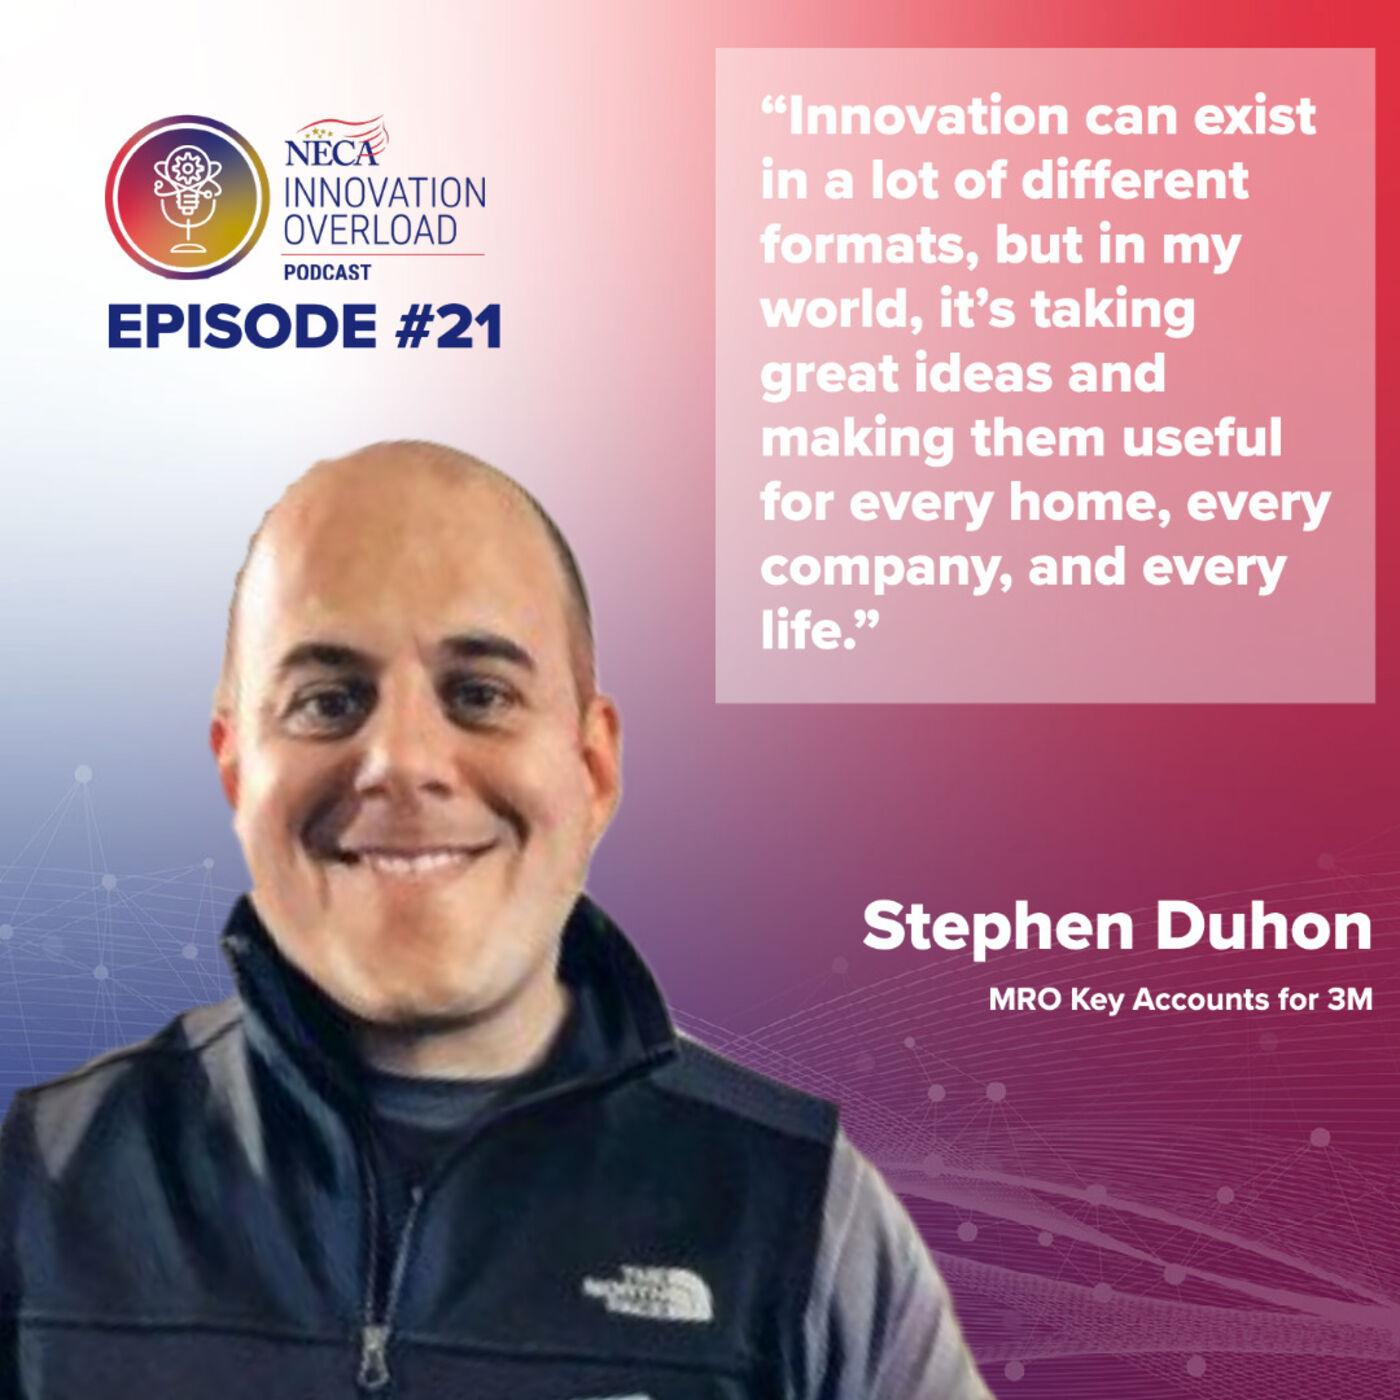 #21 - Stephen Duhon